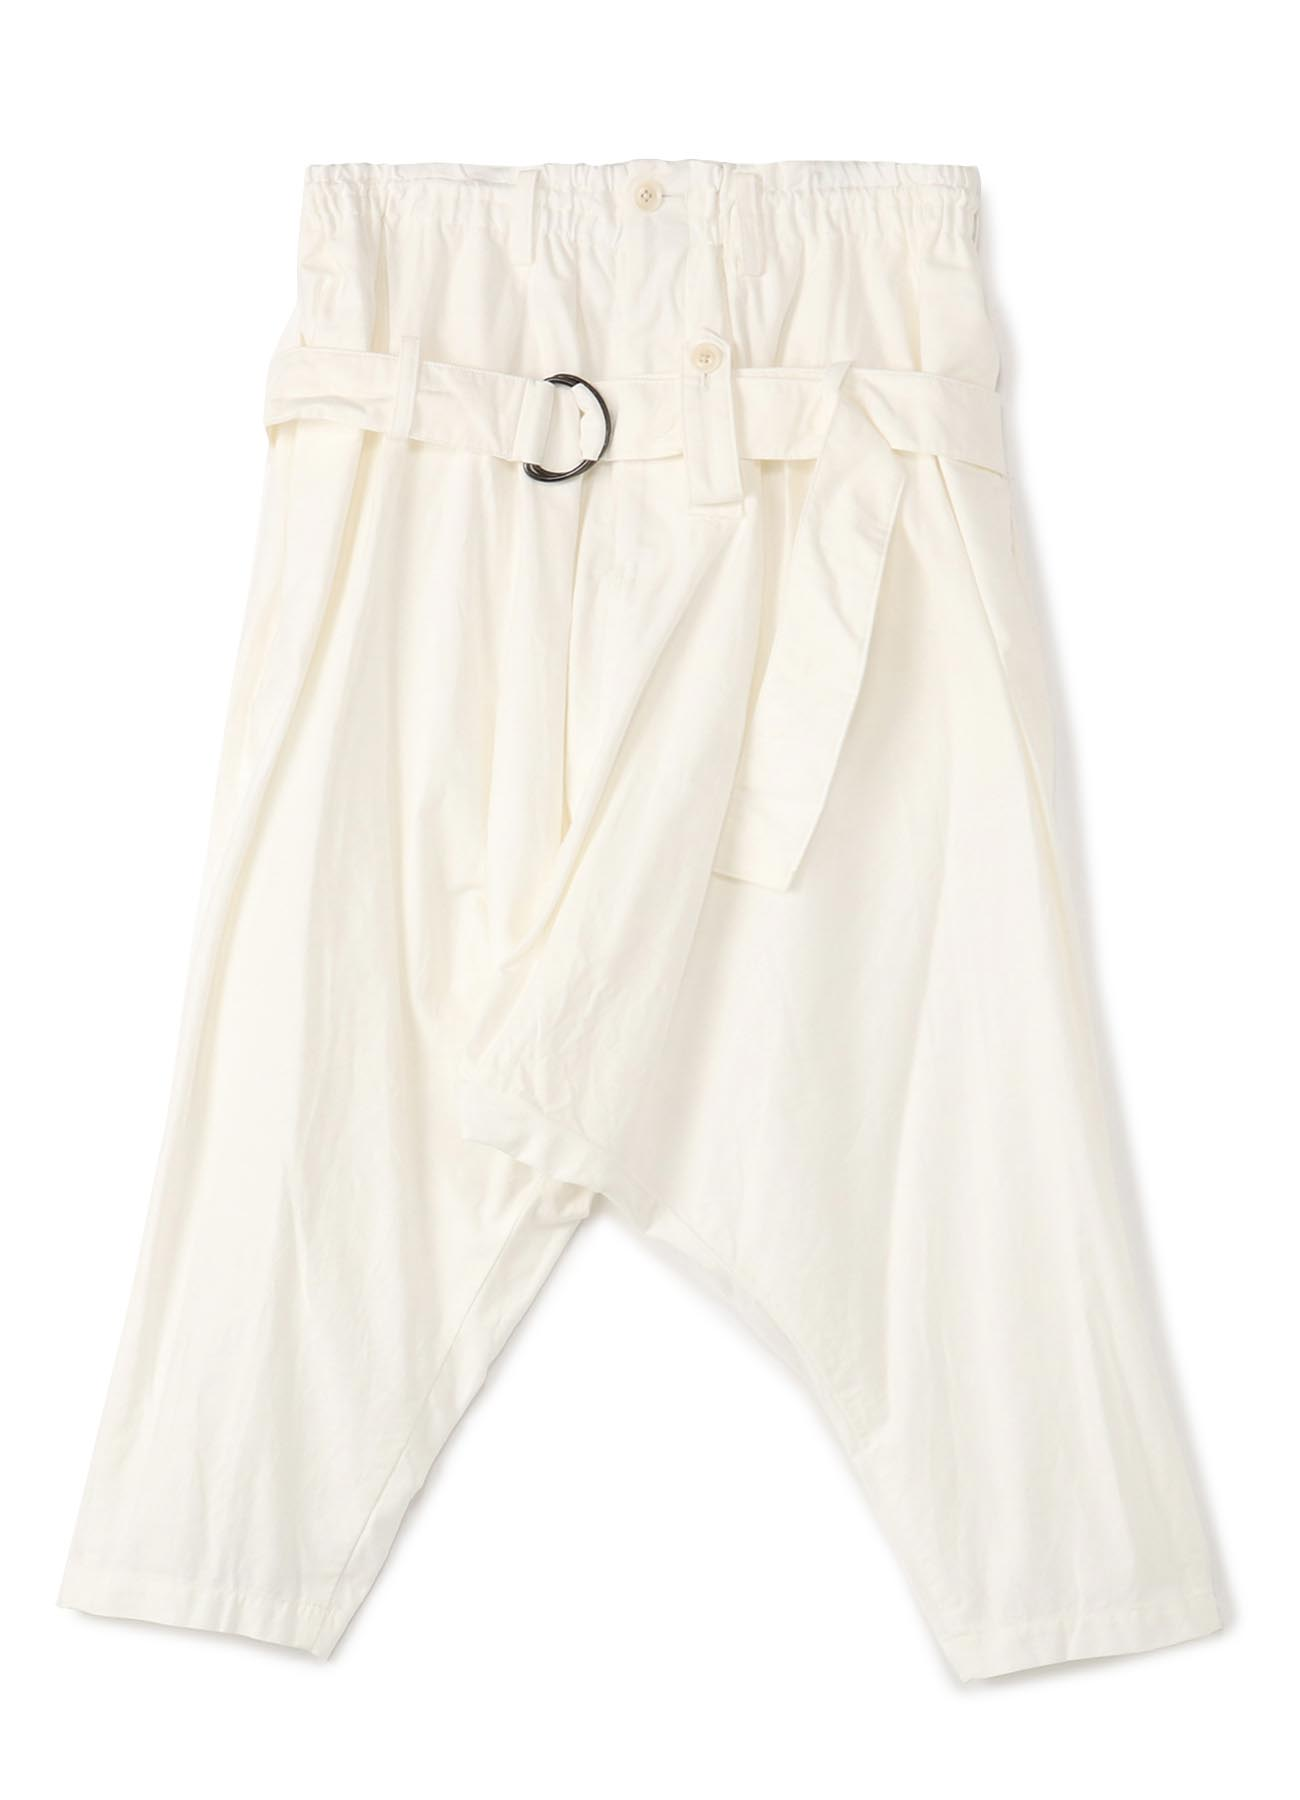 Y's BANG ON!No.104 Bandage Sarouel Pants Cotton Twill